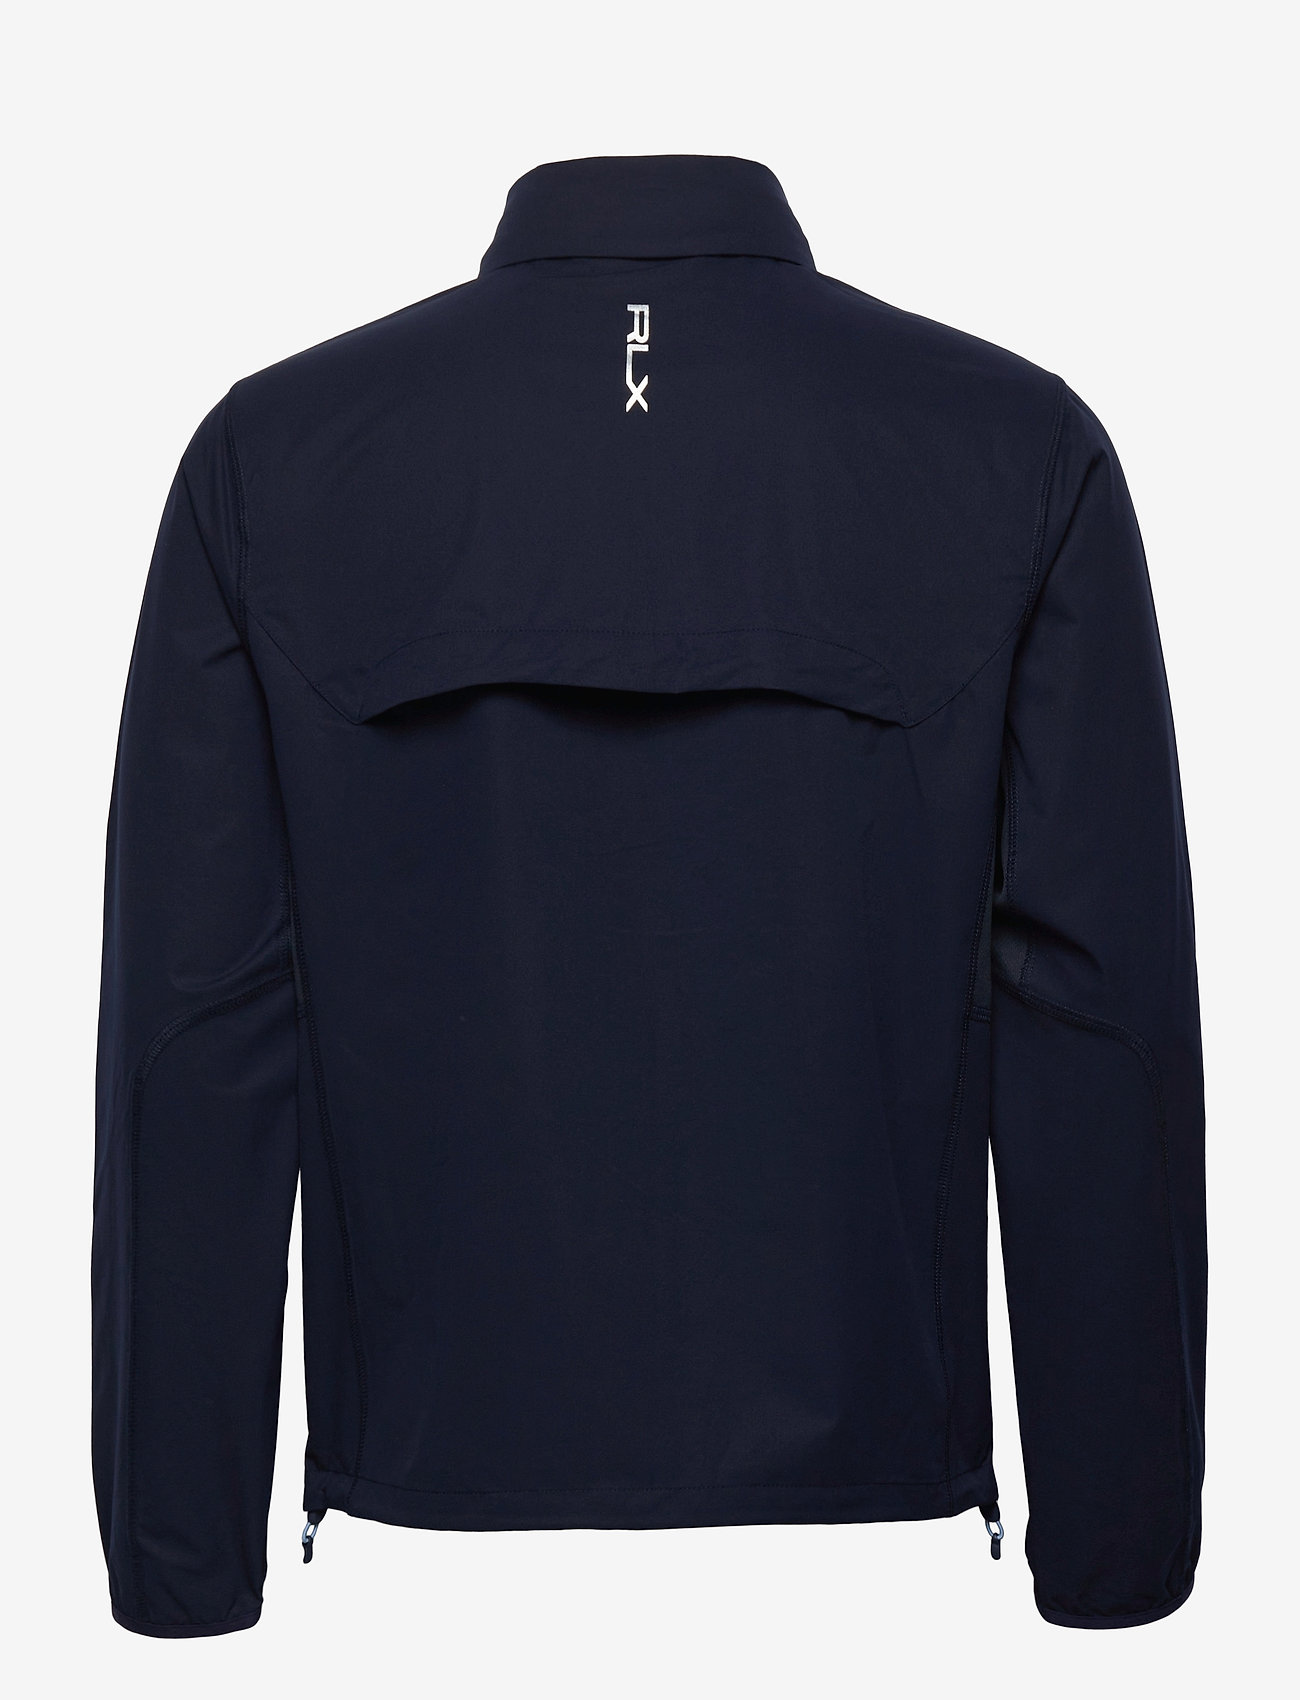 Ralph Lauren Golf - STRETCH DWR-PAR WINDBREAKER - golf jackets - french navy - 1